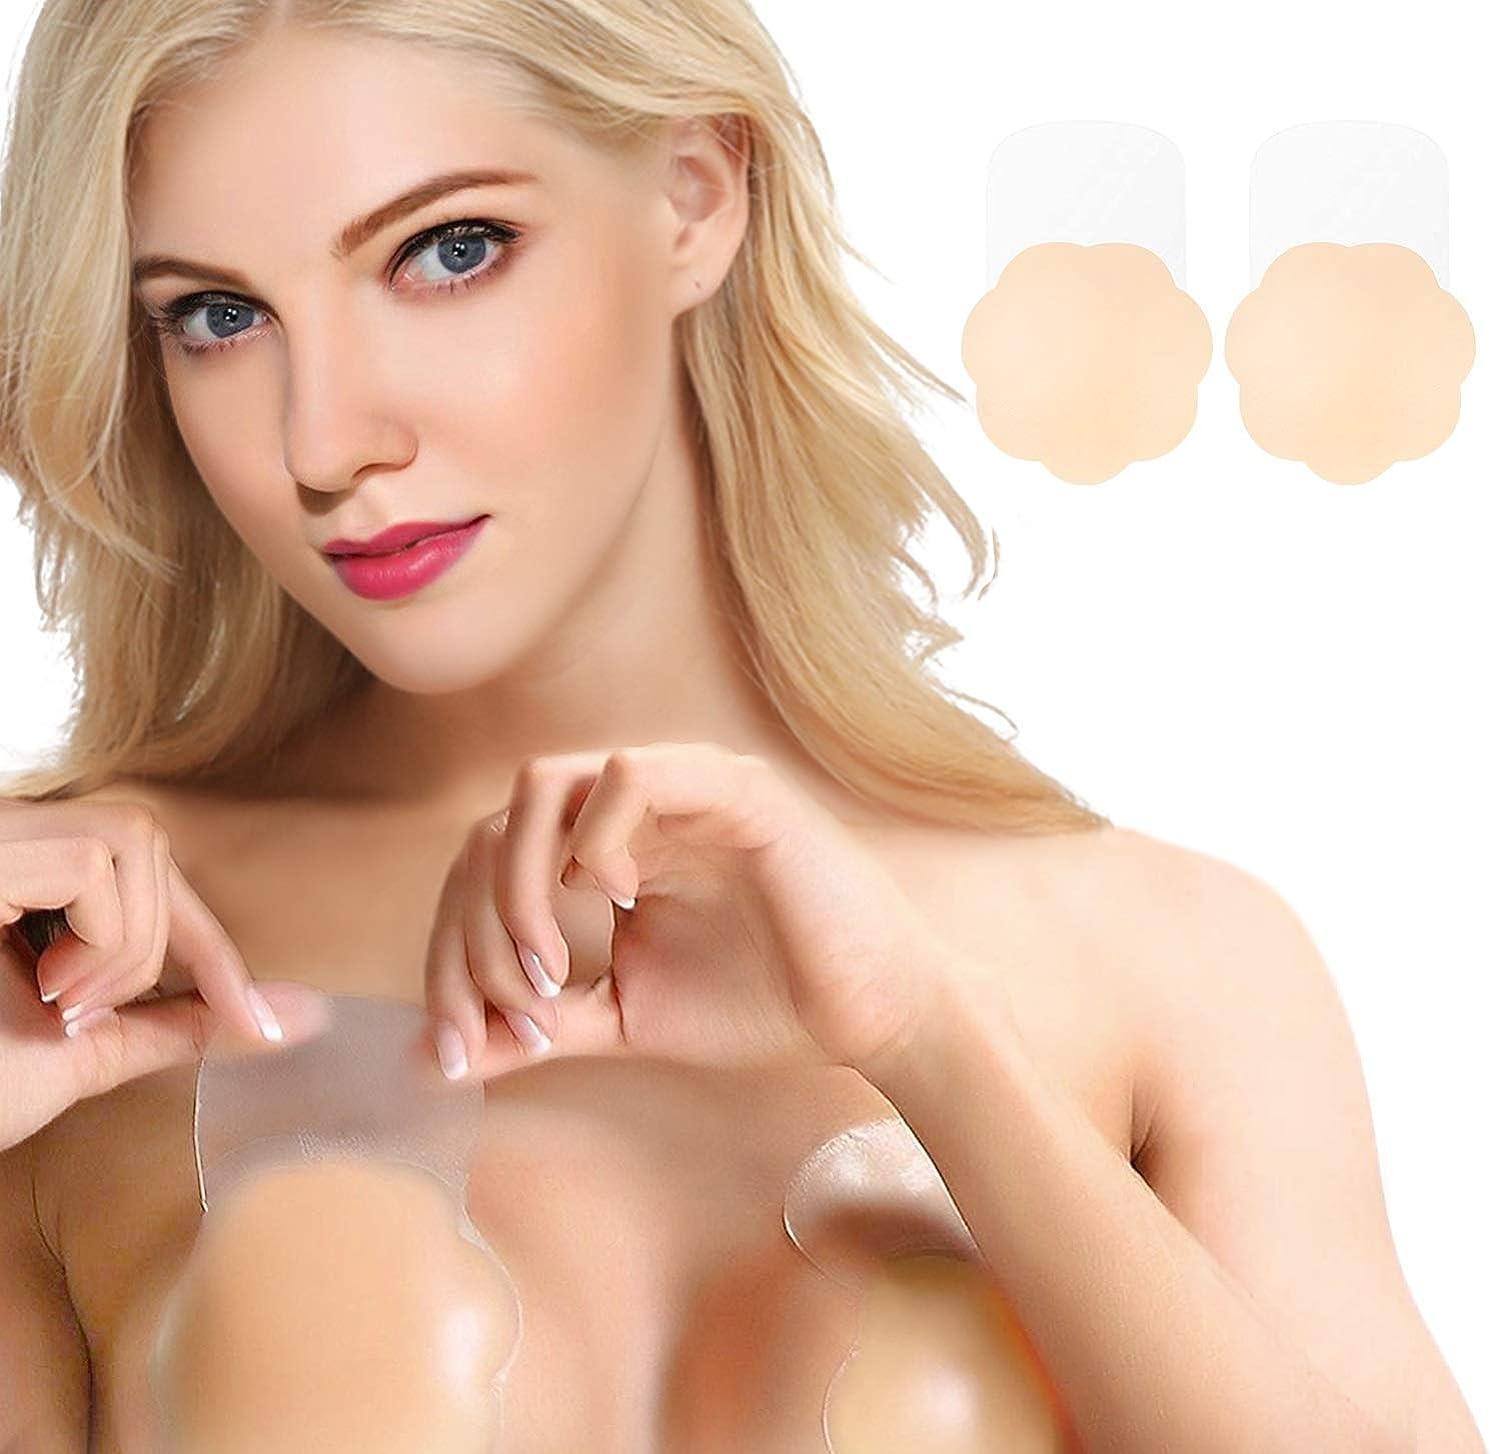 Sticky Bra Push Up,Women Breast Petals Lift Nipplecovers Adhesive Backless Strapless Bra